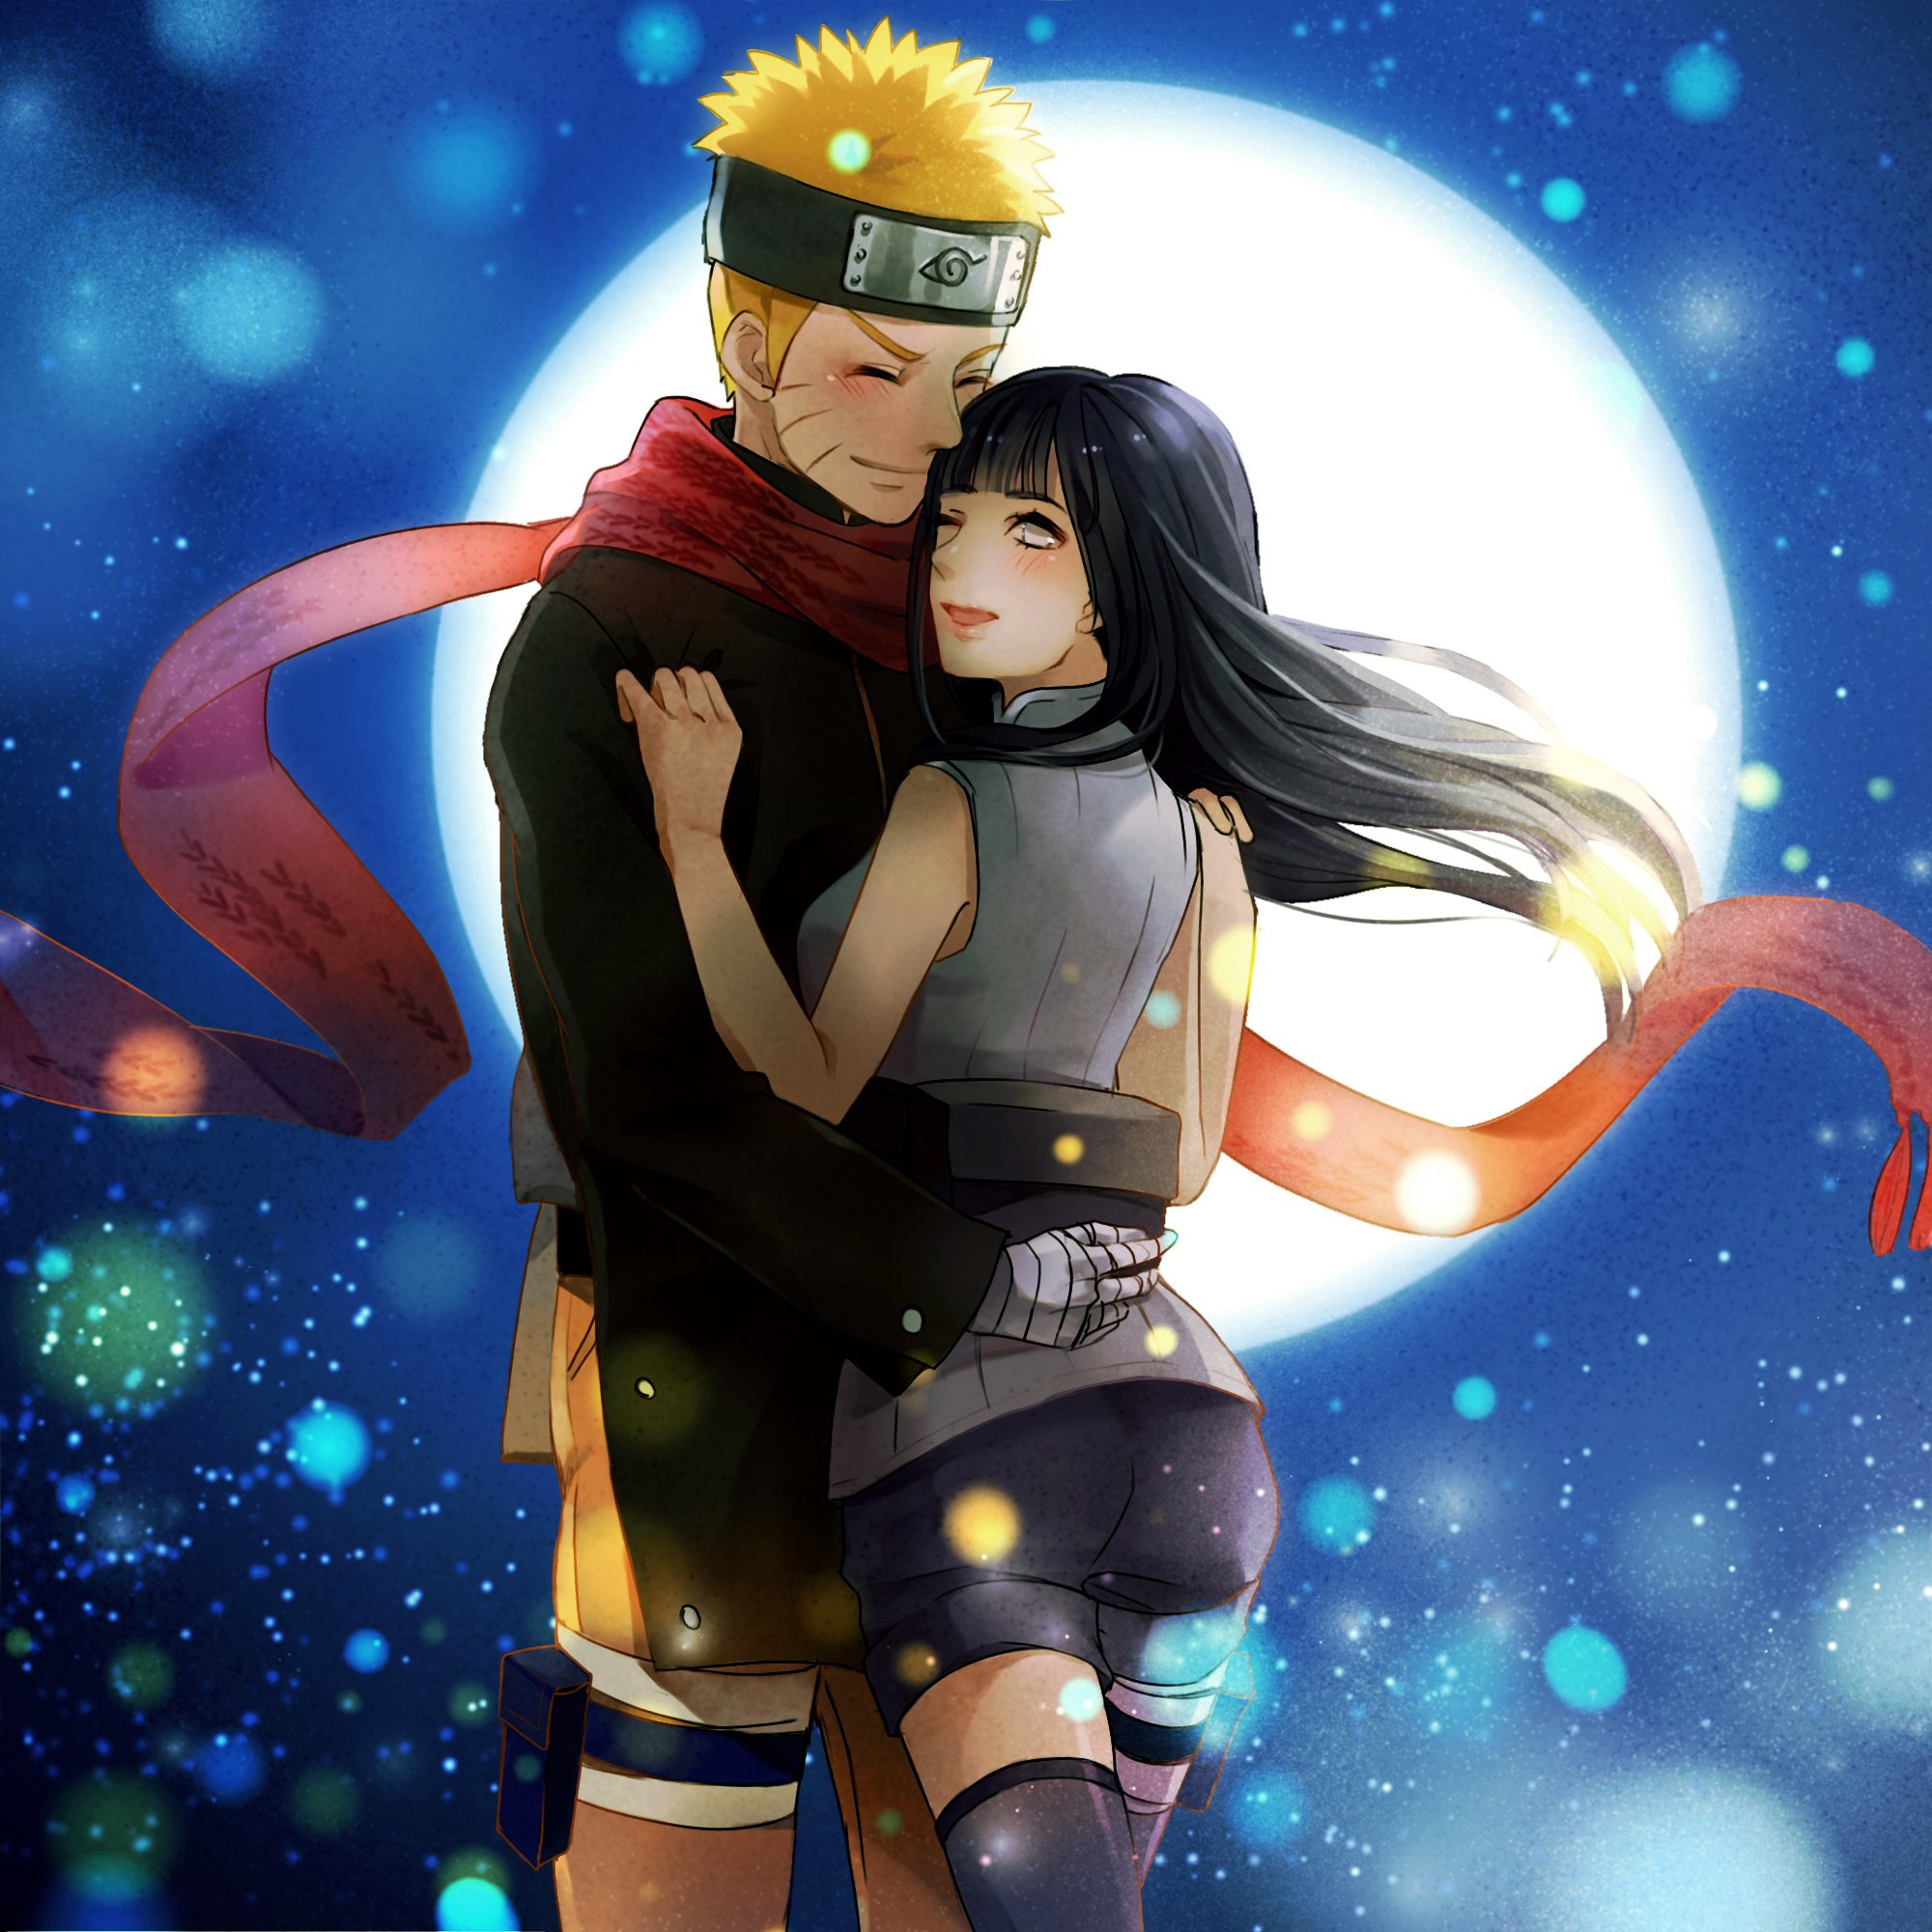 Naruto Hd Wallpaper: Naruto Love Hinata Wallpaper